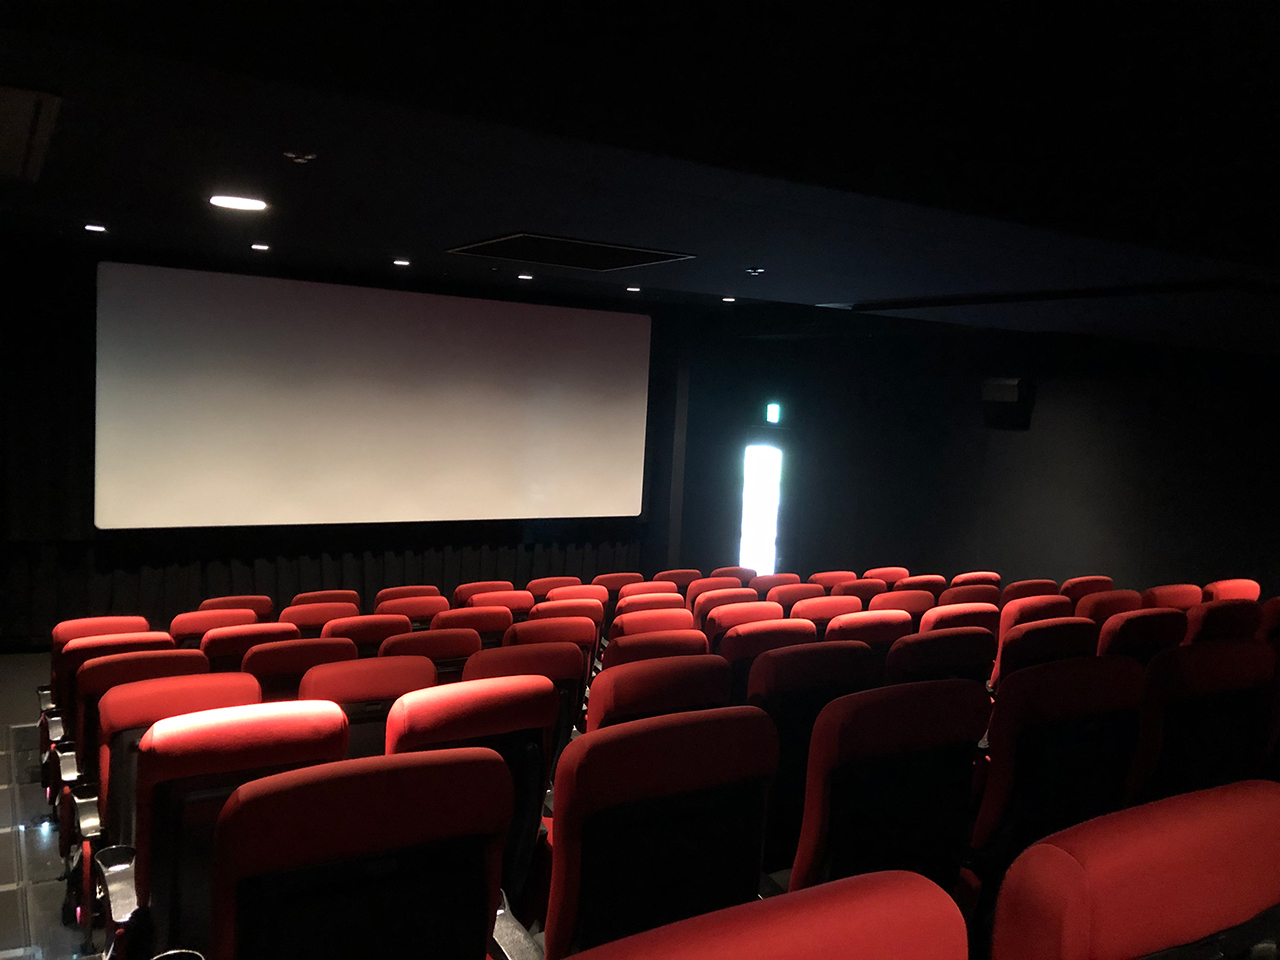 〈KINO cinema みなとみらい〉のシアター2座席の様子